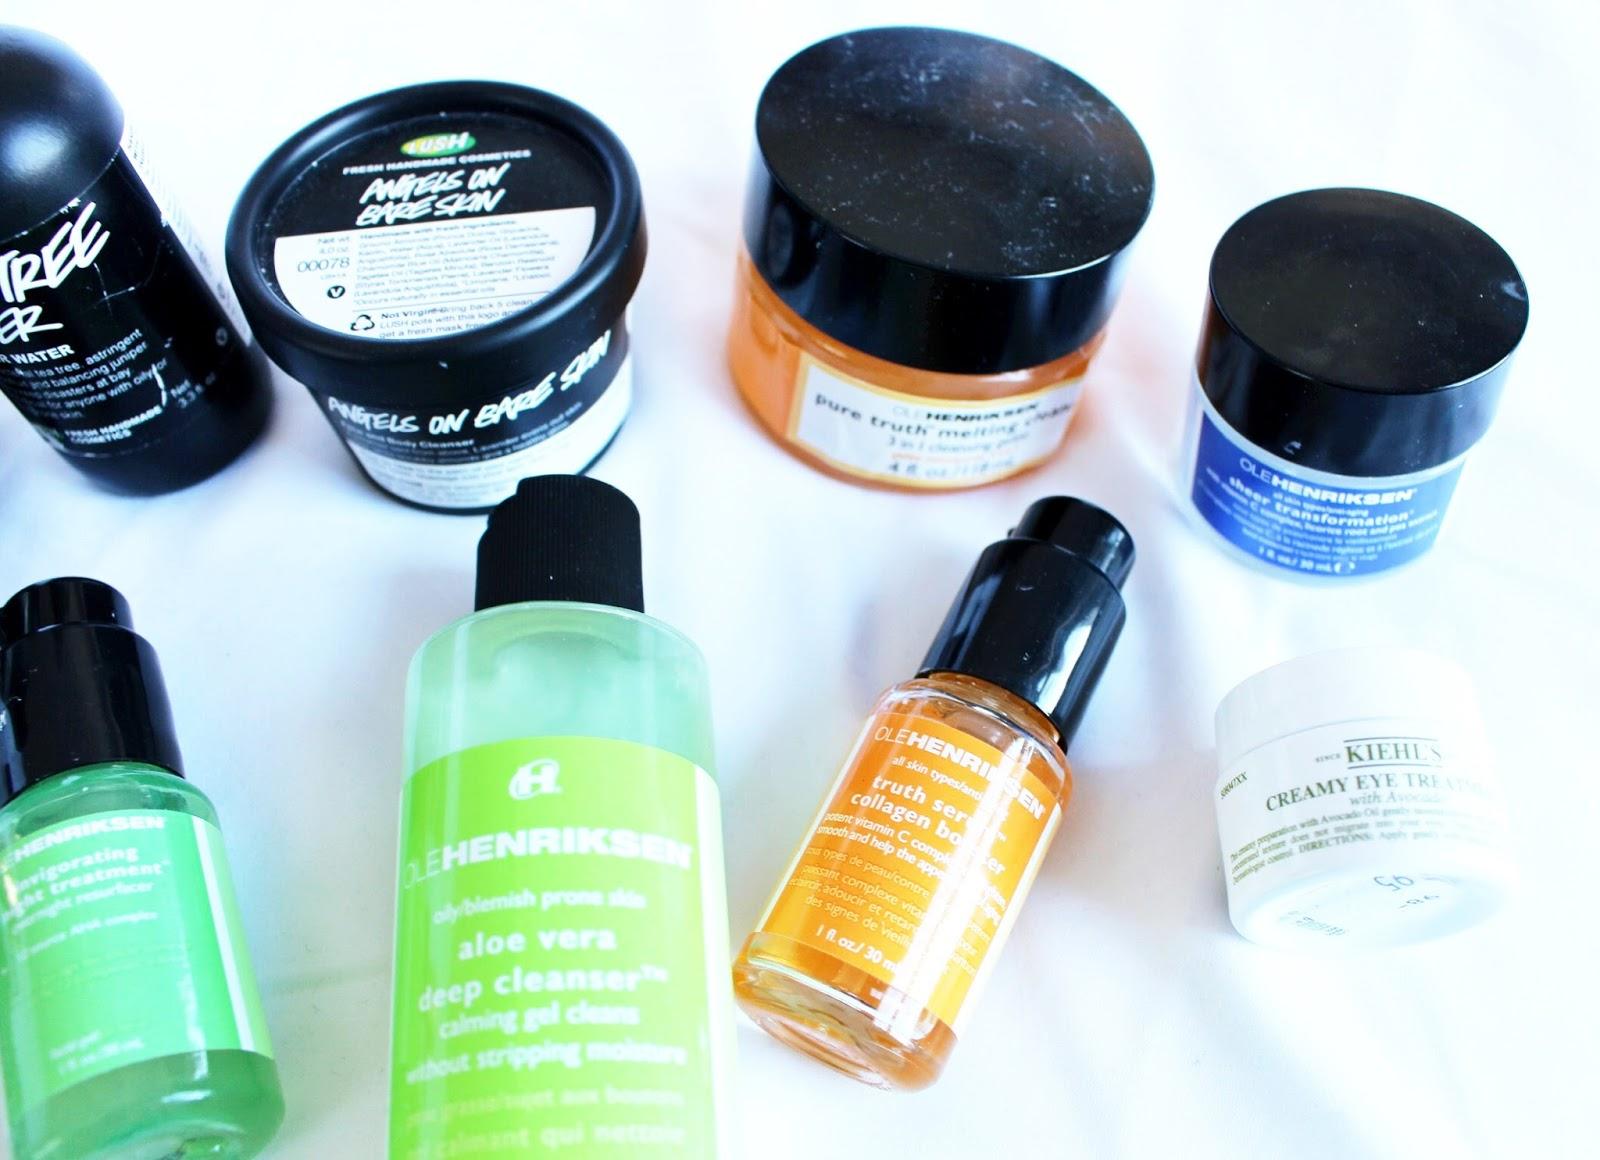 skincare routine - lush, sunday riley, ole henriksen, the body shop